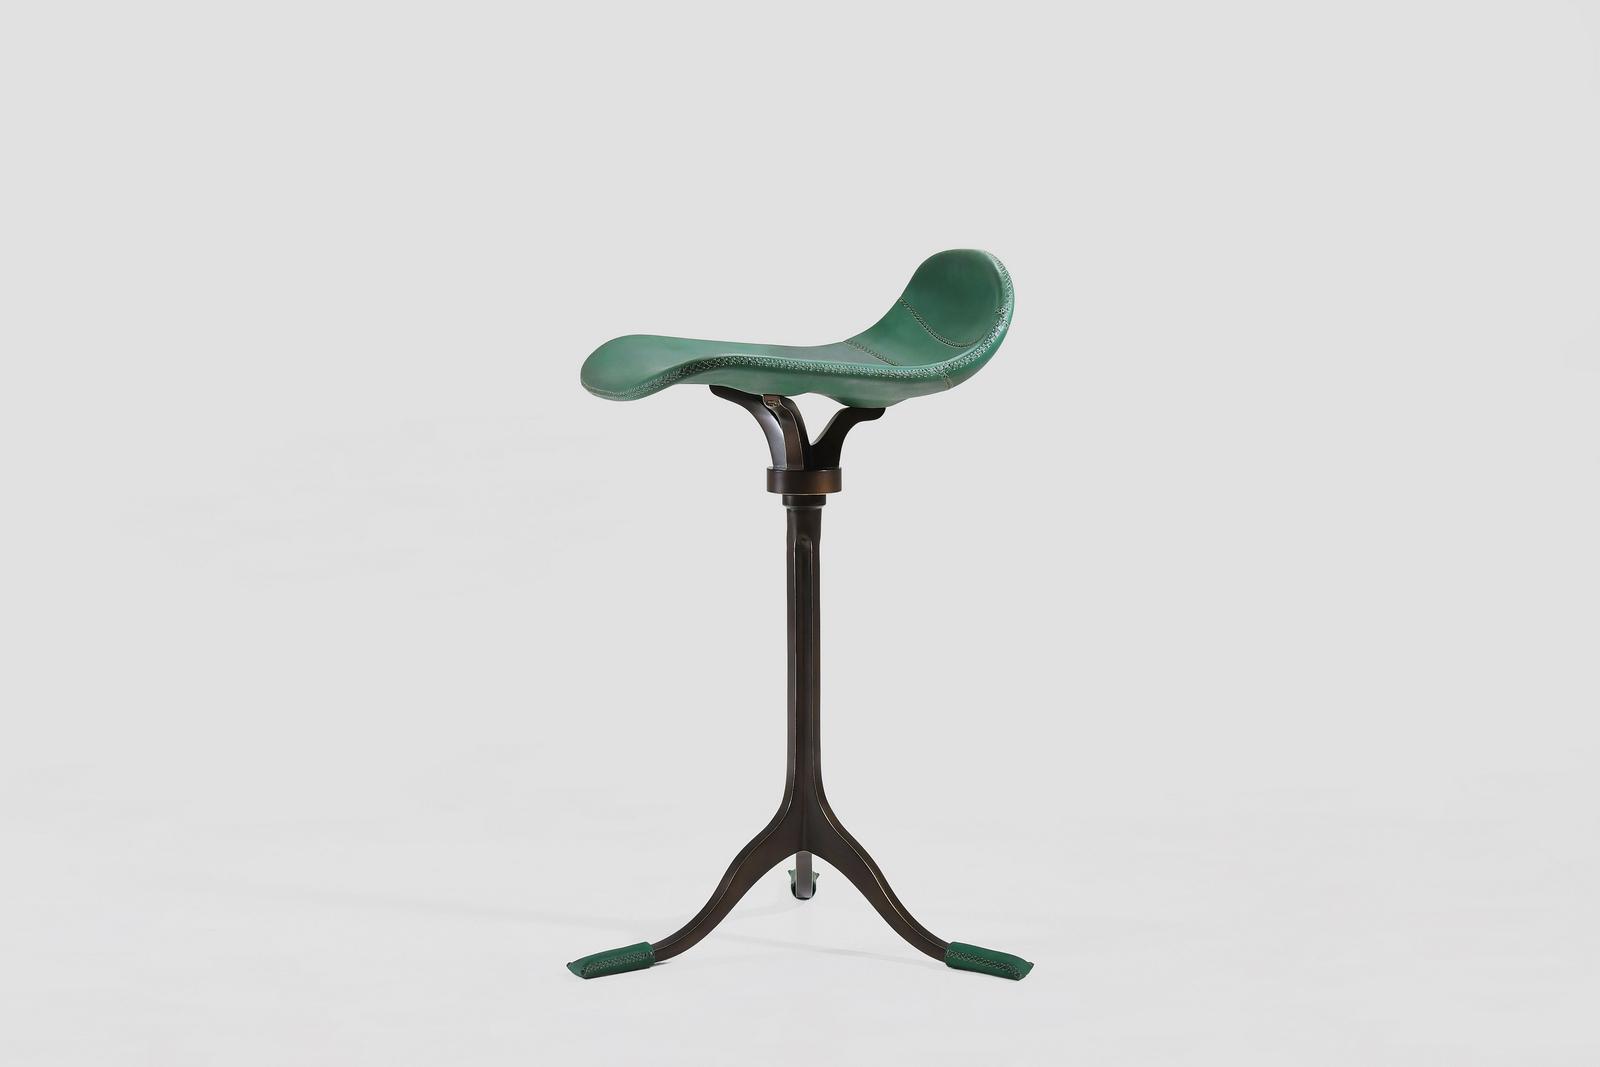 PTendercool-Chair-PT48-BS3-GR-04